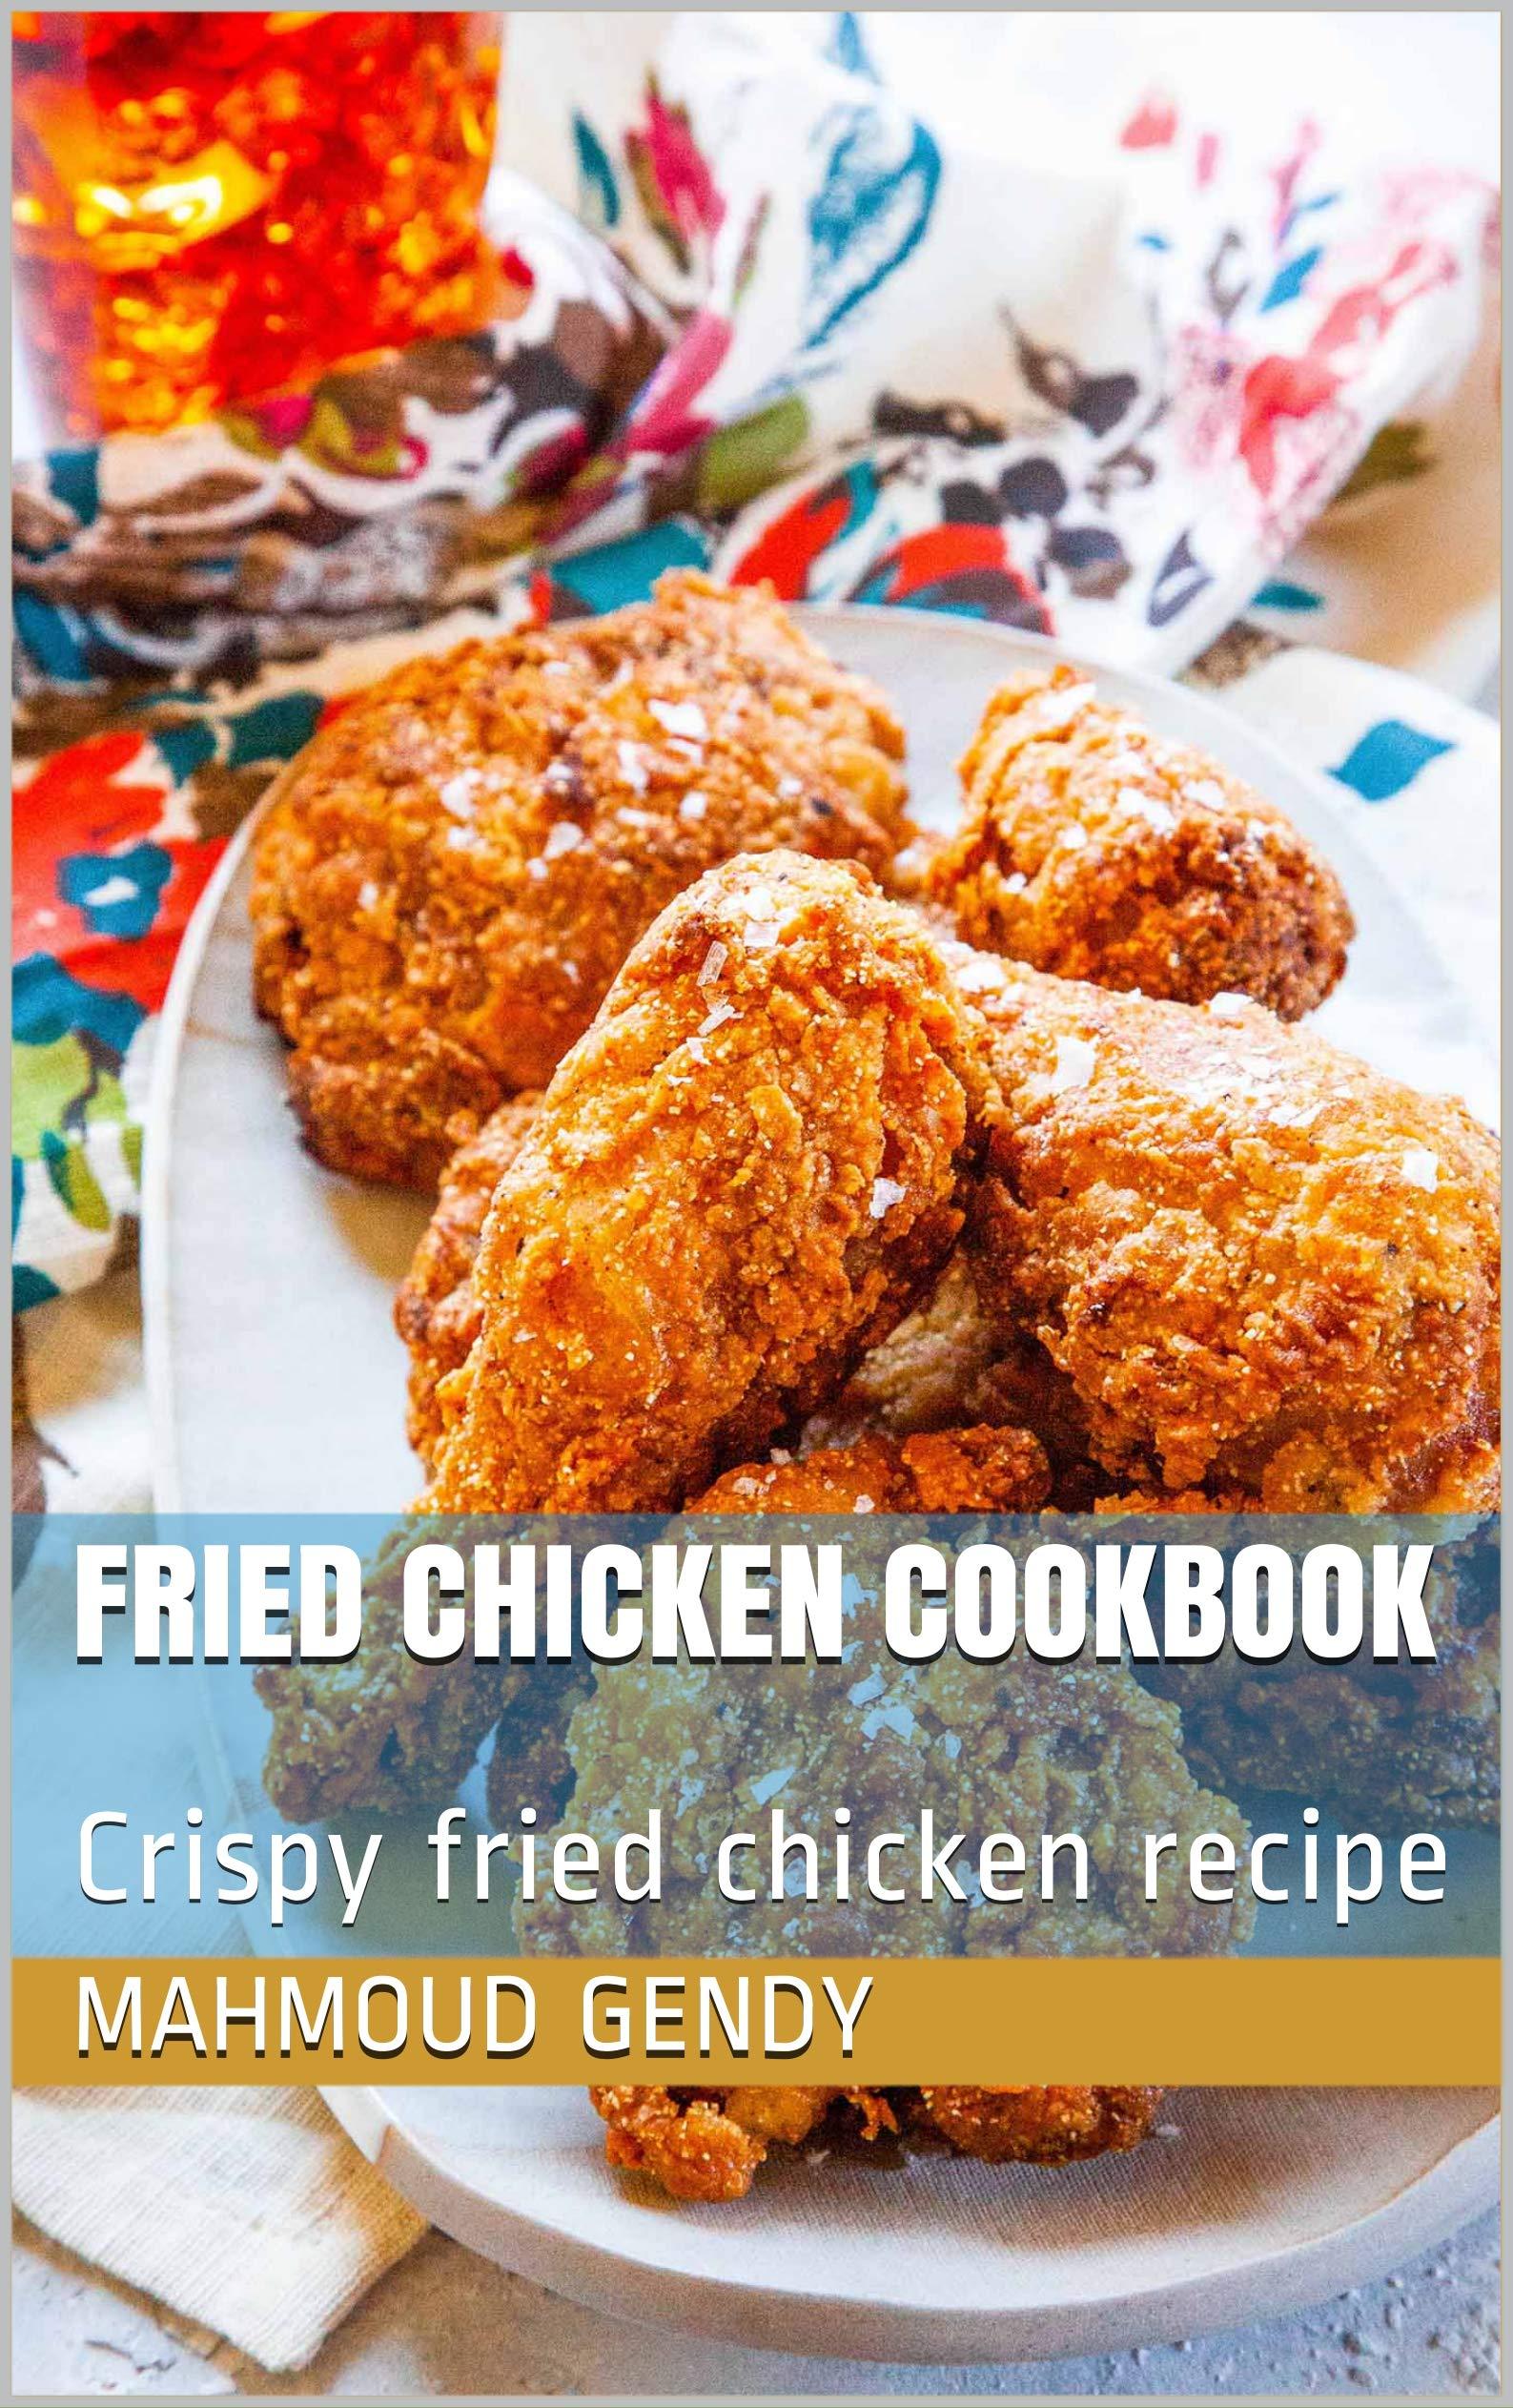 fried chicken cookbook: Crispy fried chicken recipe